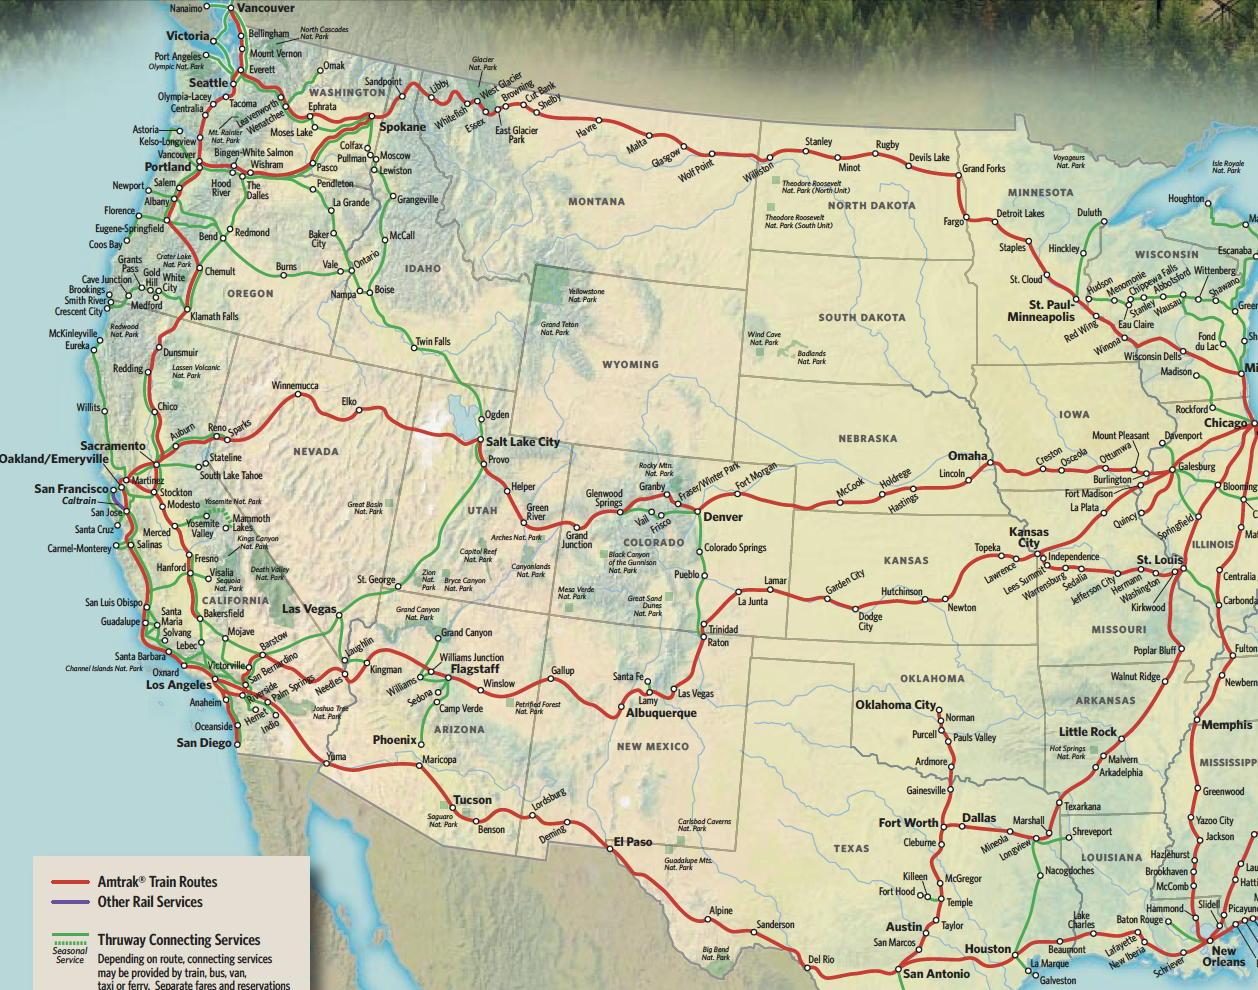 Train Links California State Map California Zephyr Route Map - California Zephyr Map